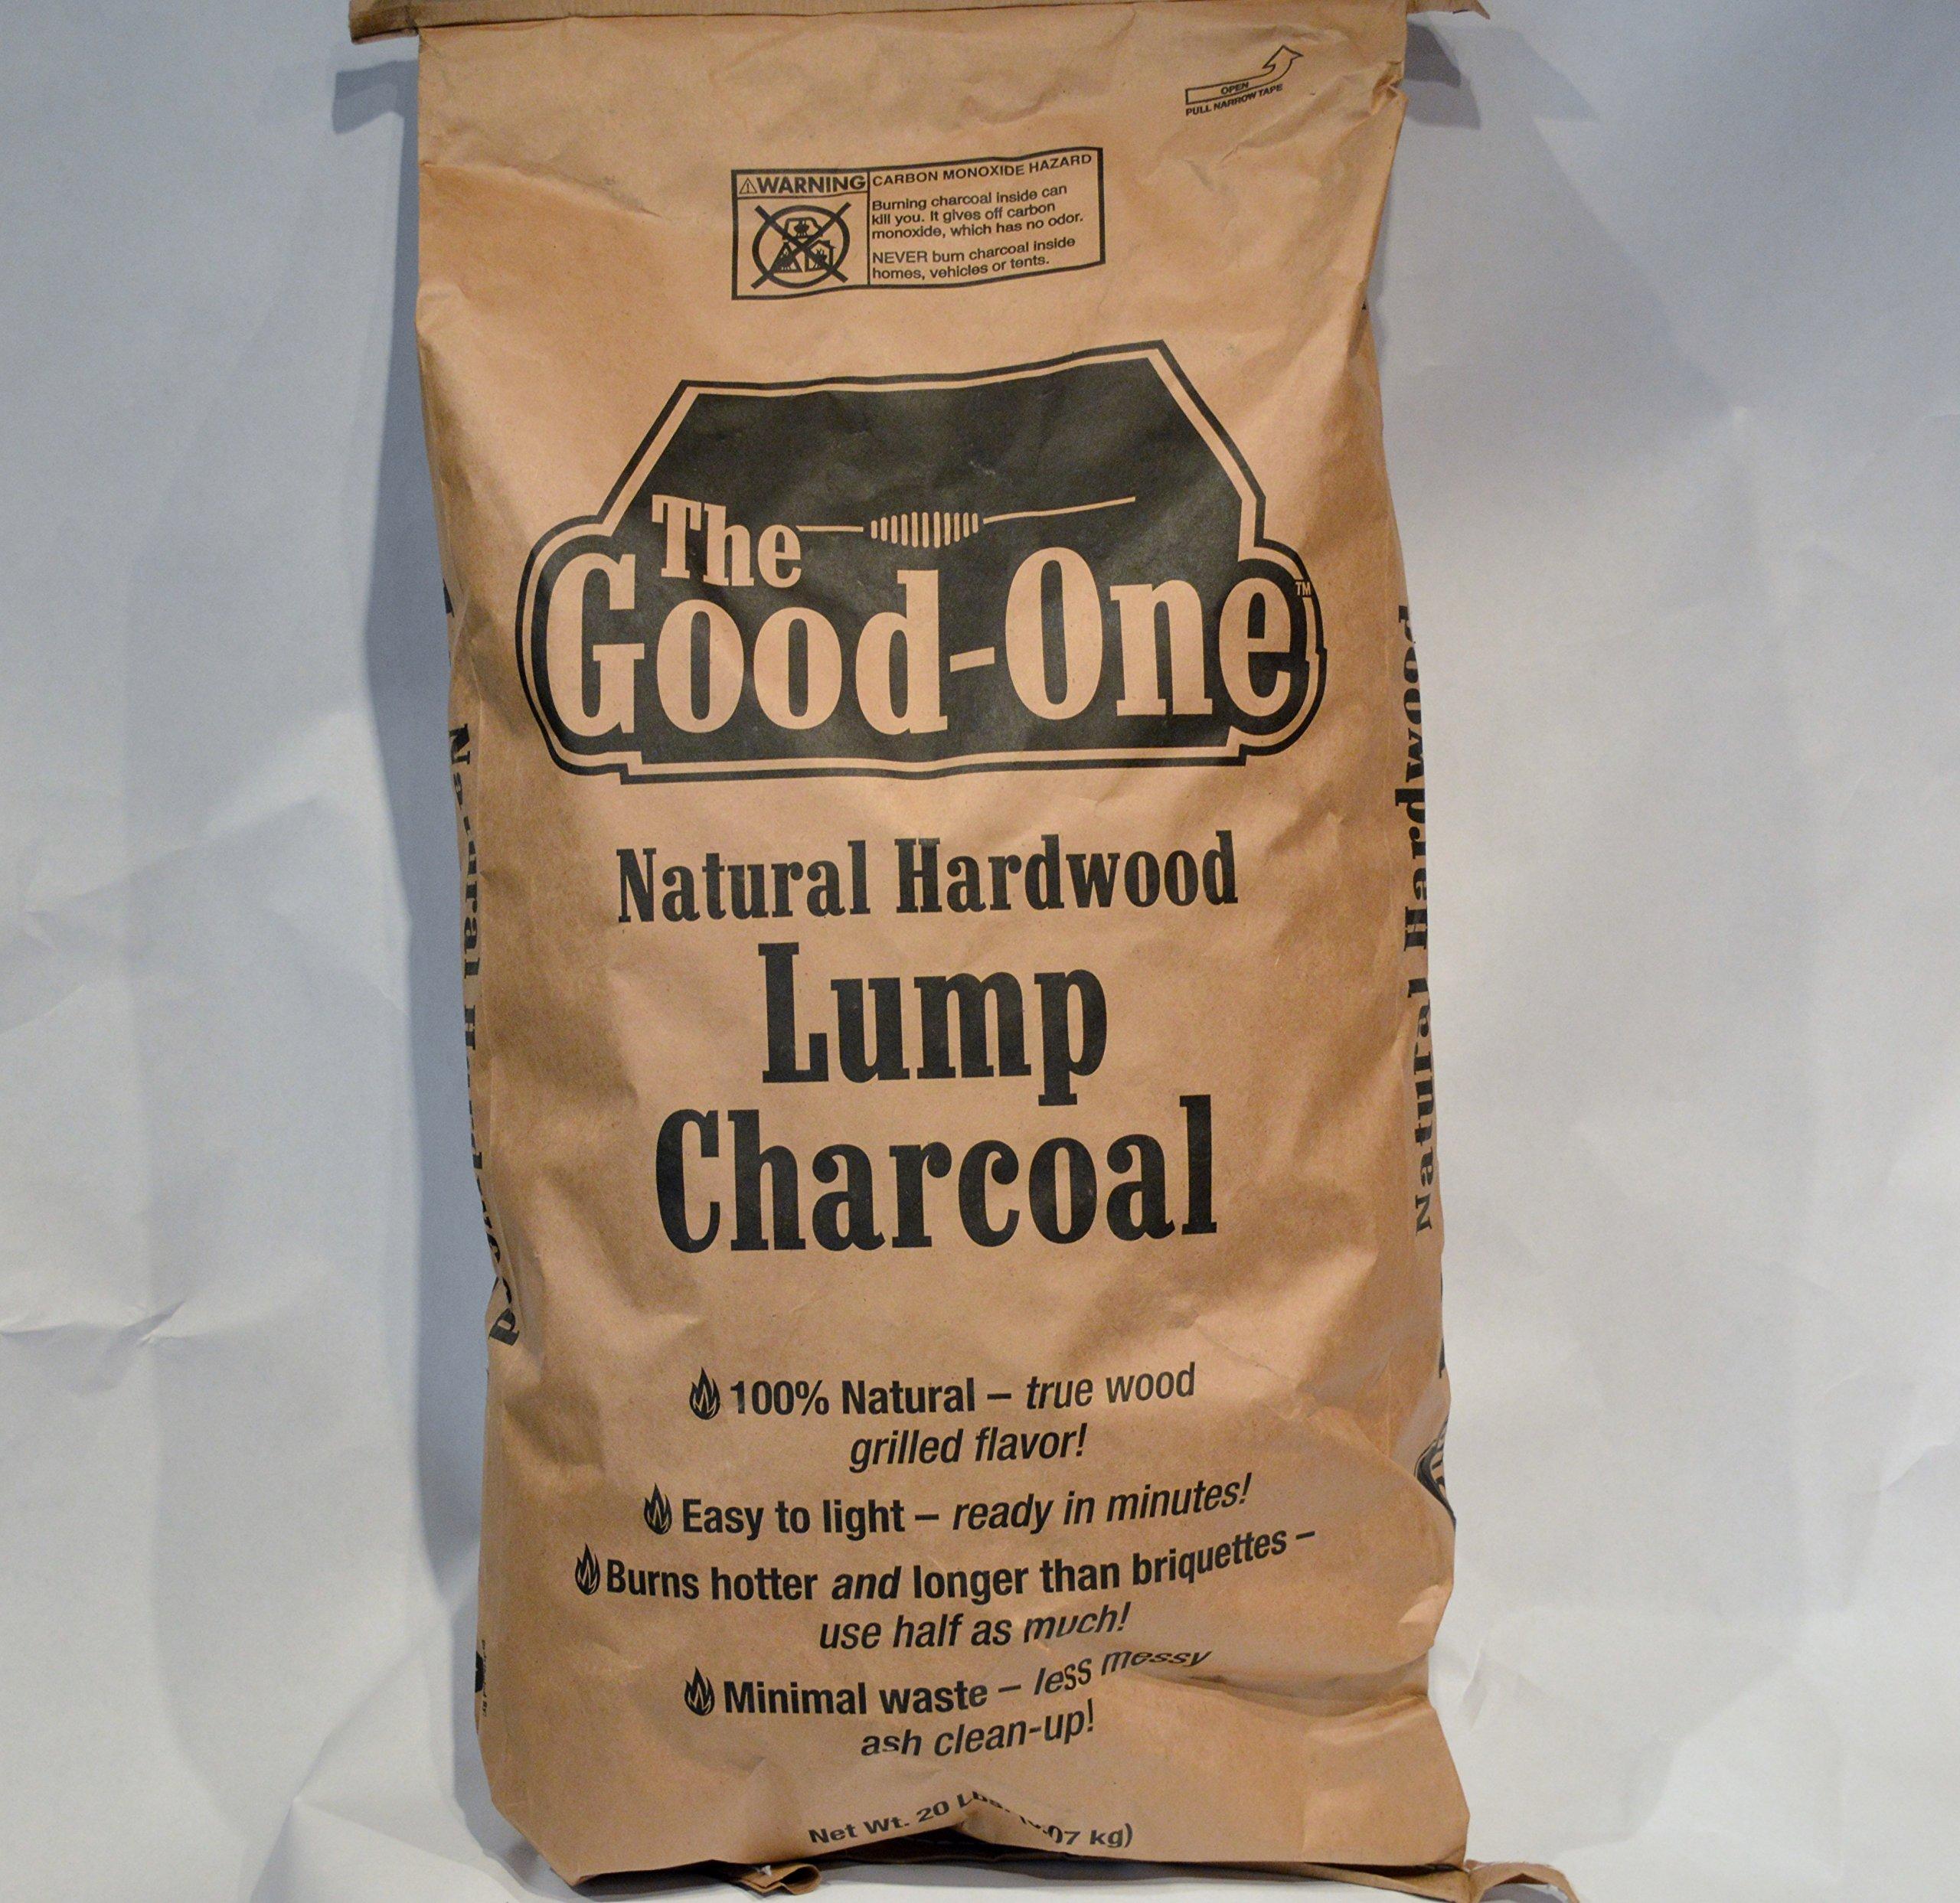 The Good-One Lump Charcoal - 20 LB Bag Hardwood Lump Charcoal-Pallet of 30 bags